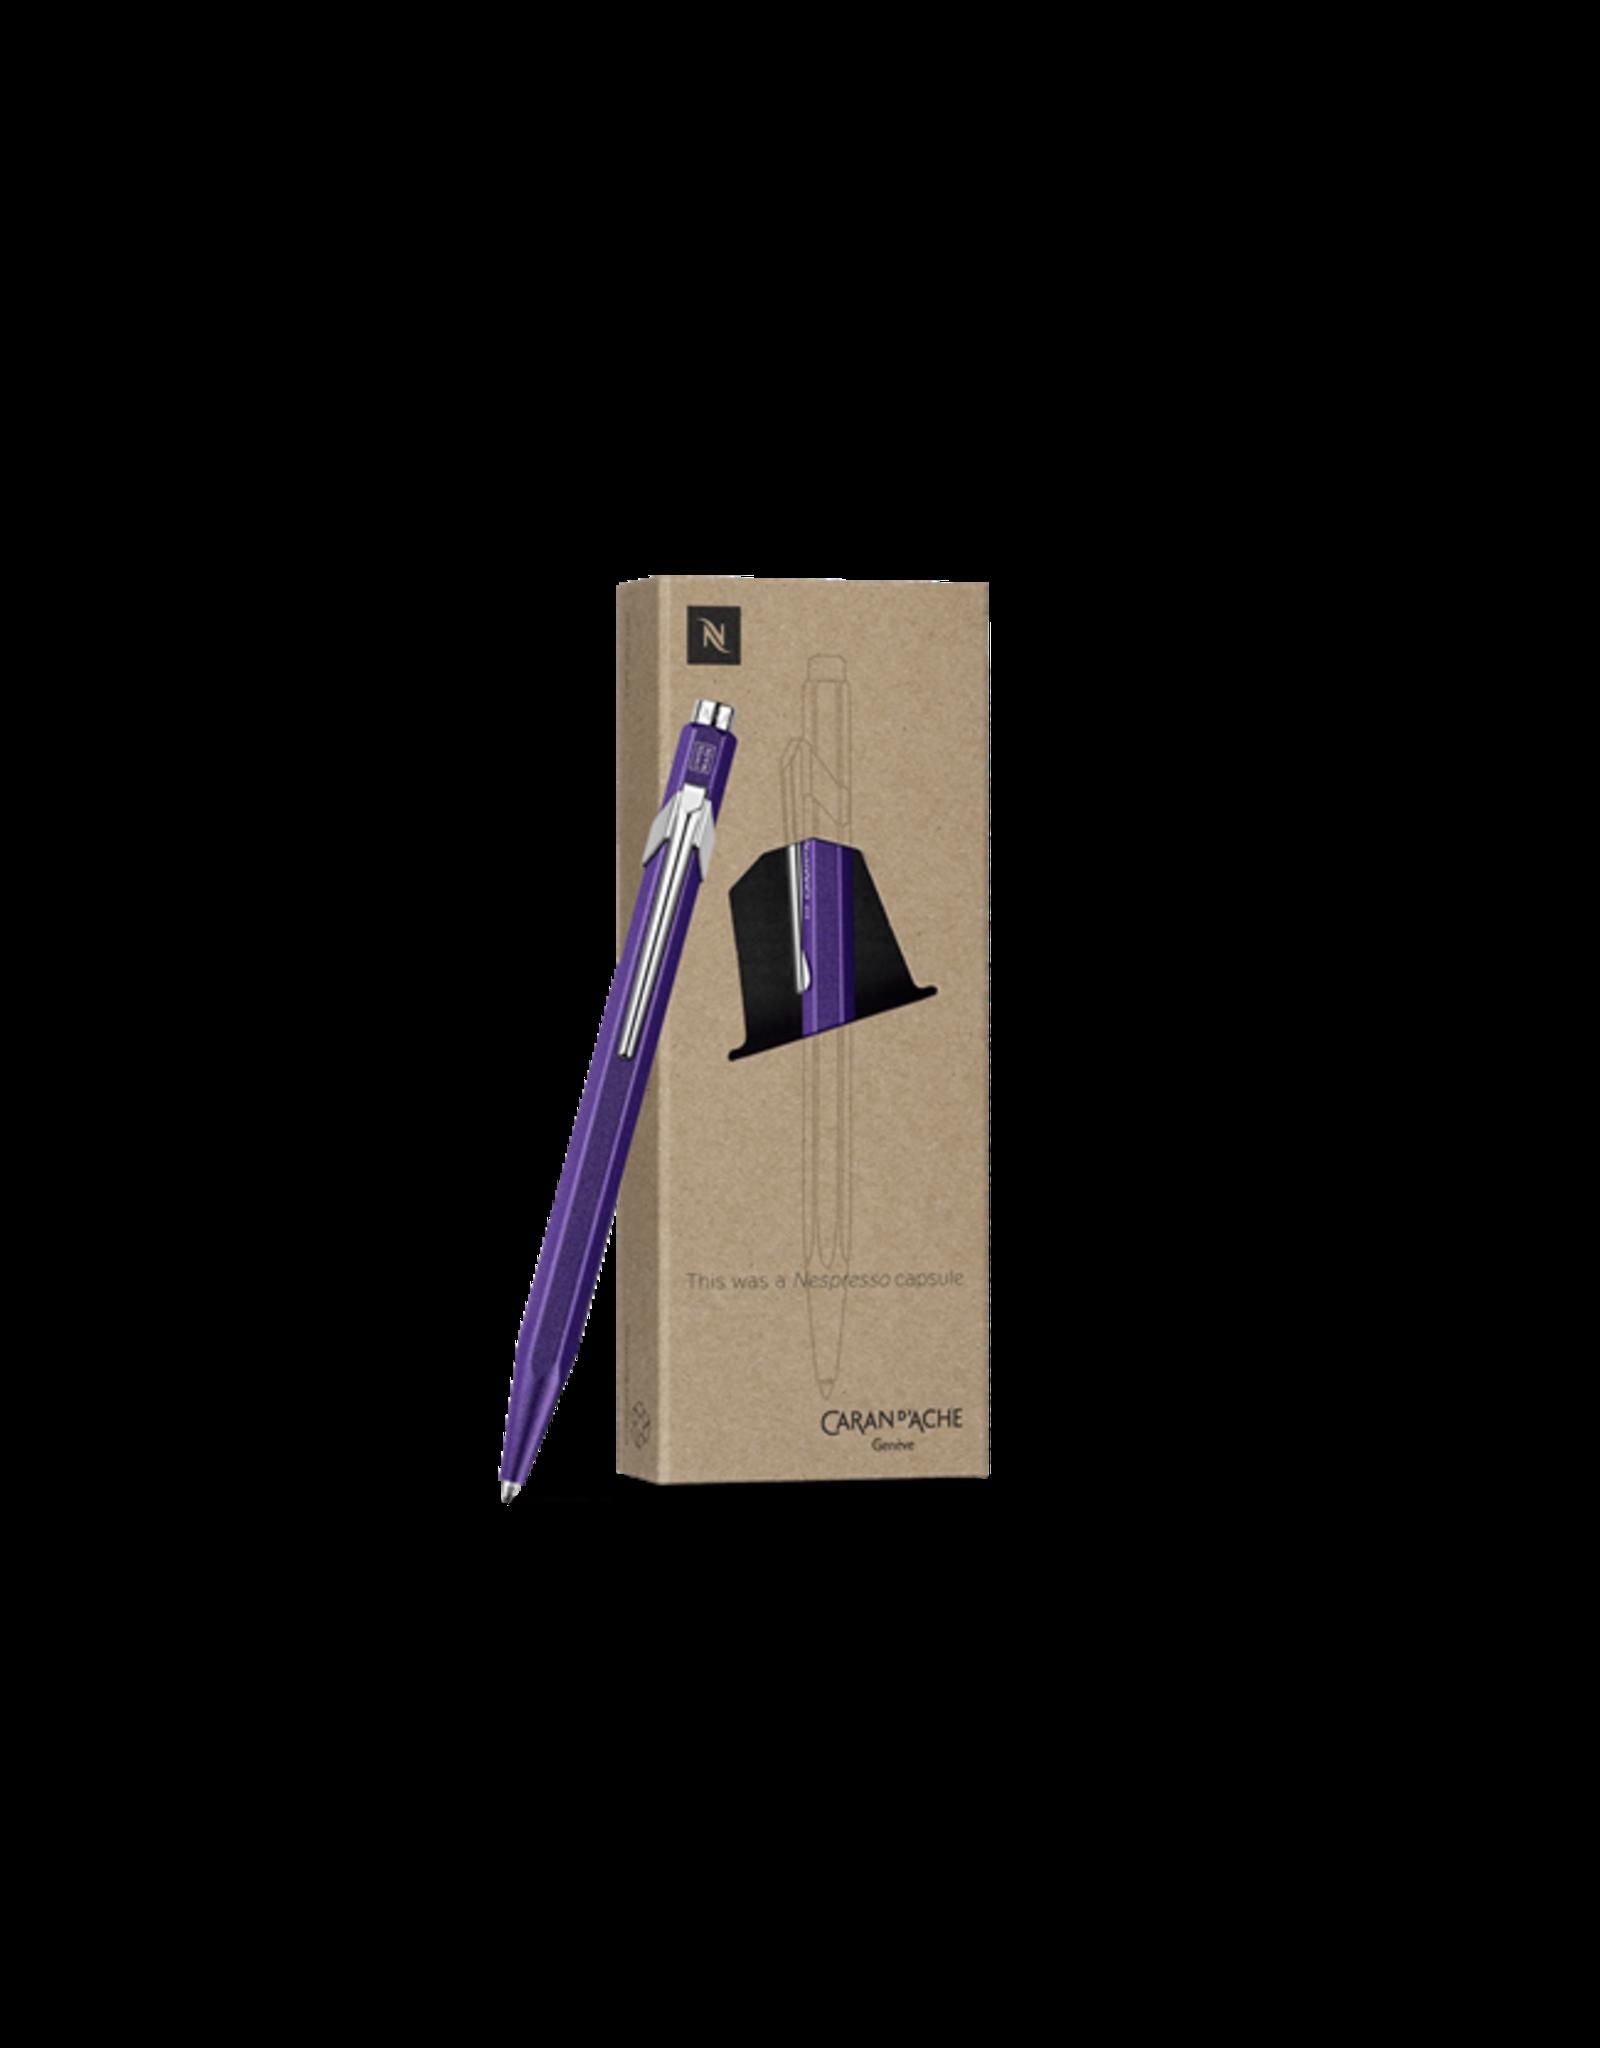 Caran d'Ache Nespresso balpoint 849 II - Limited edition